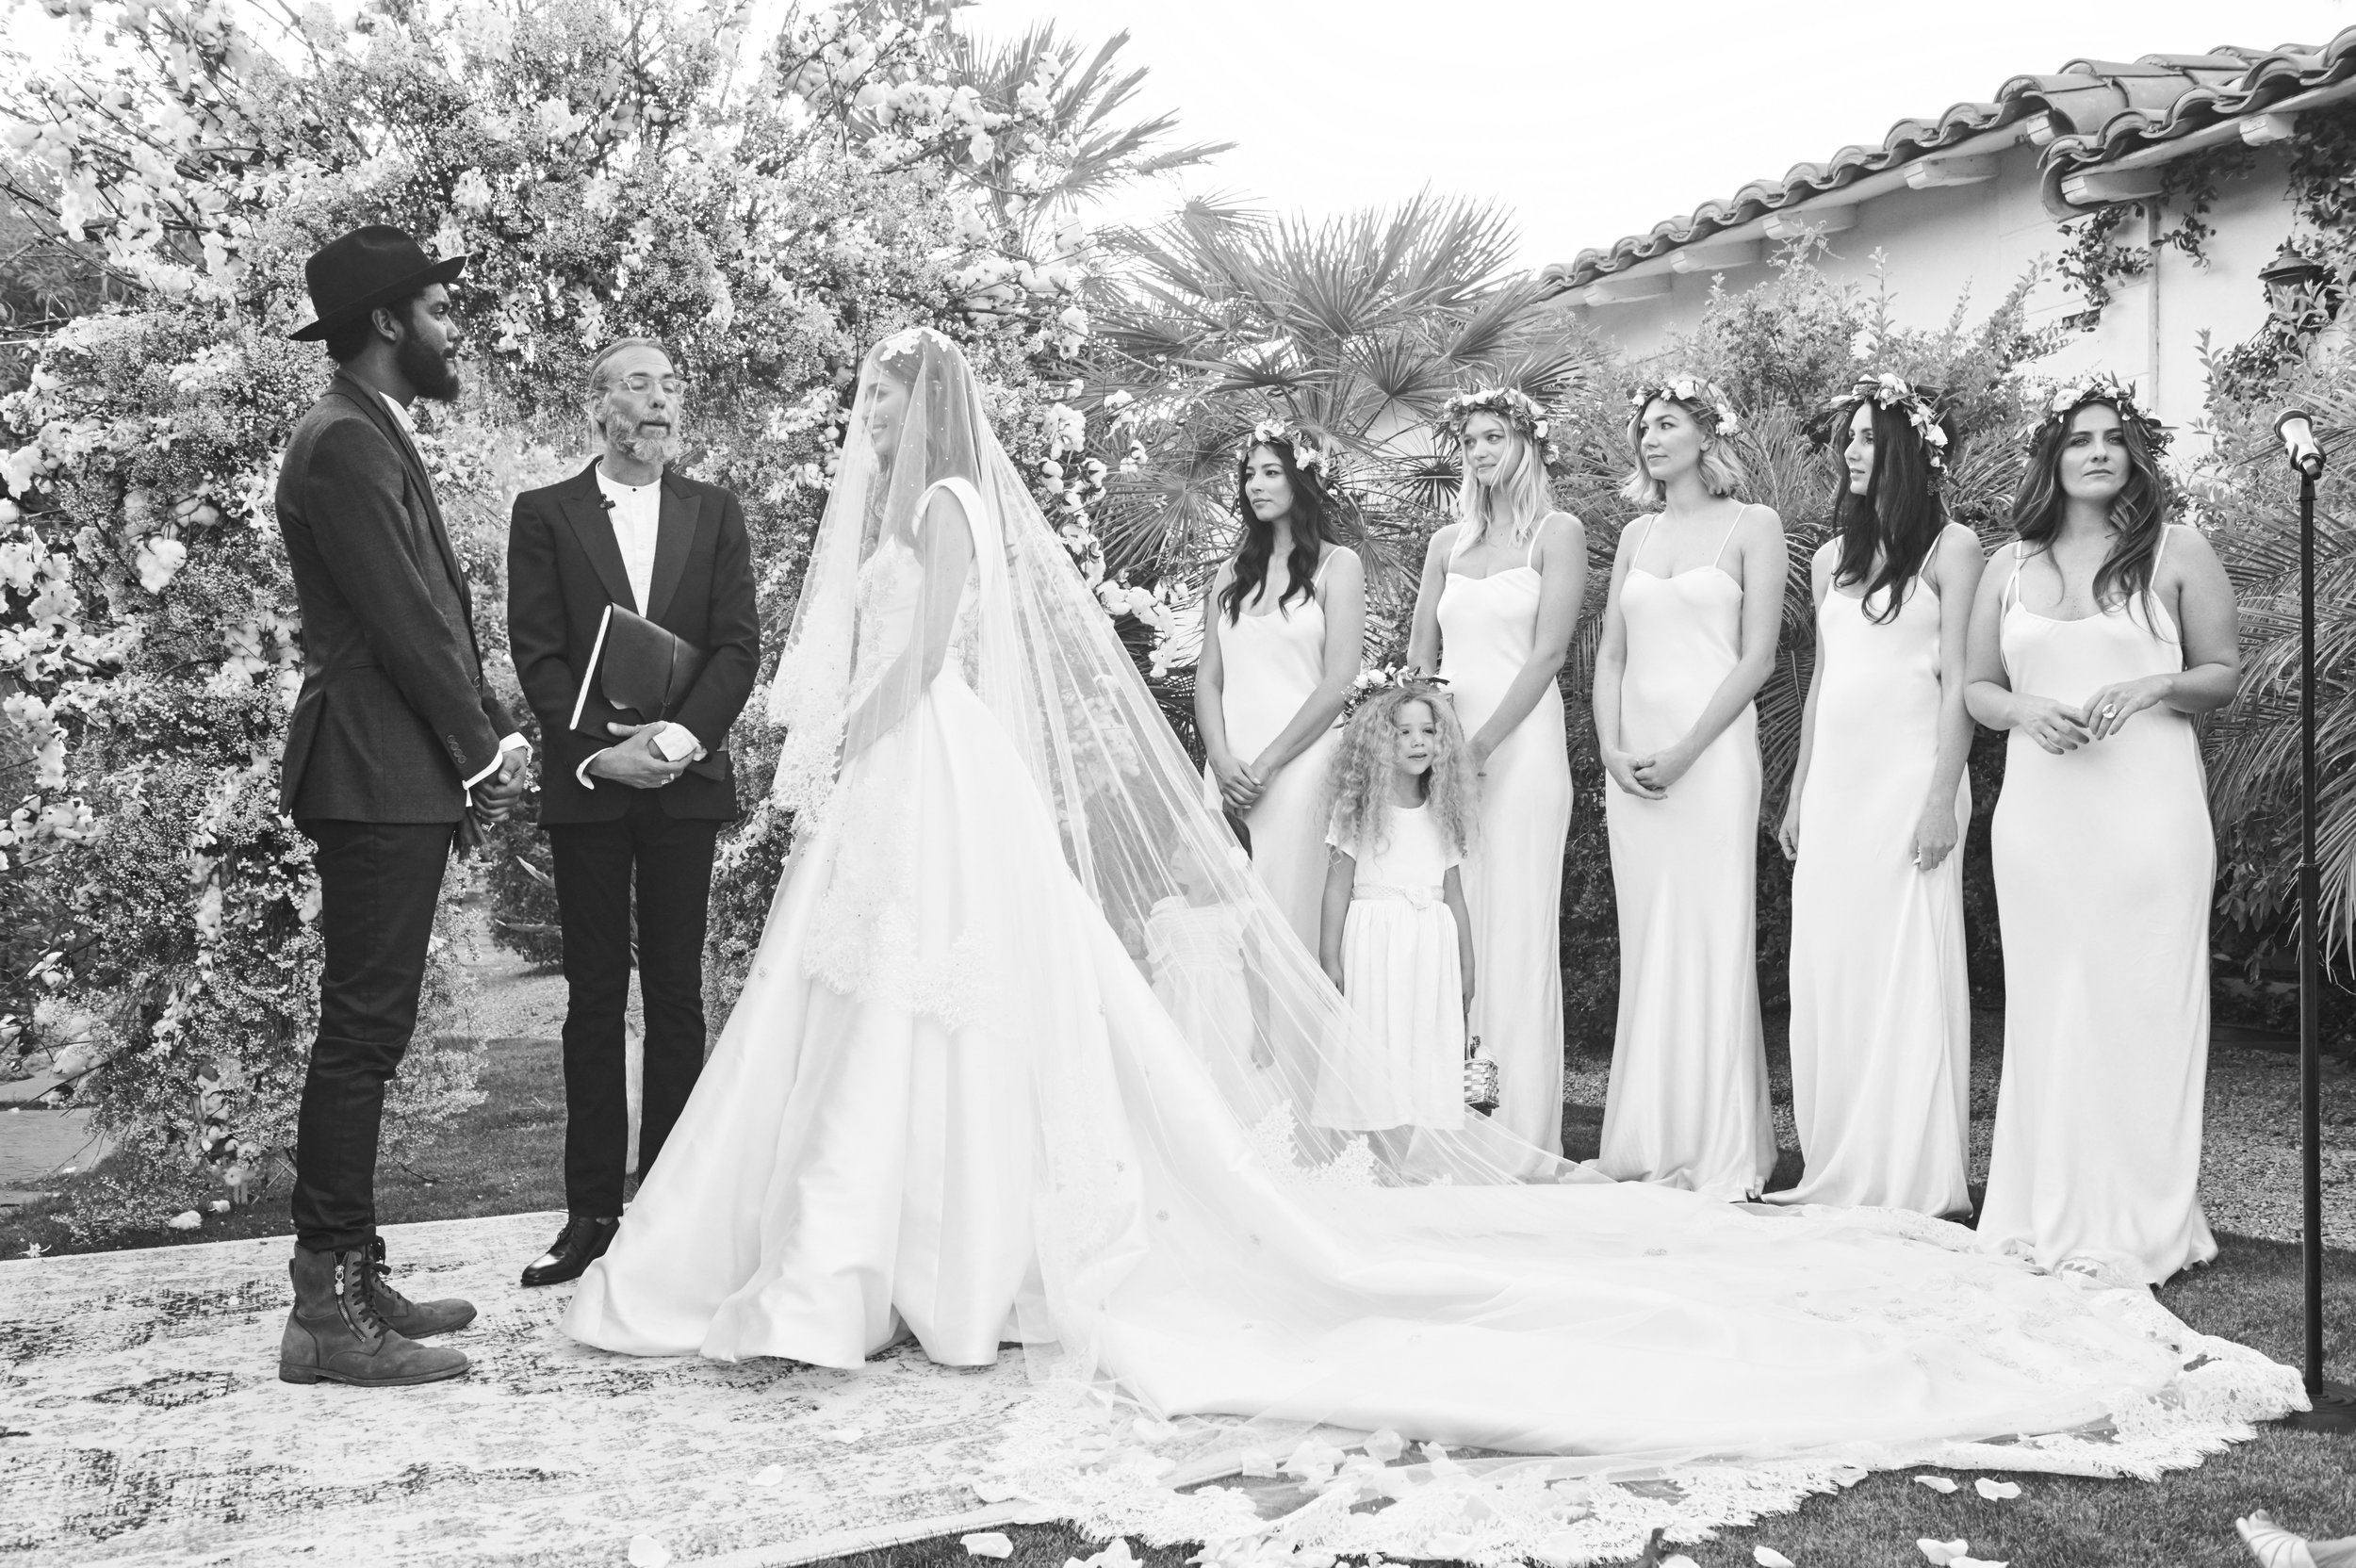 Nicole Trunfio Wedding Photos